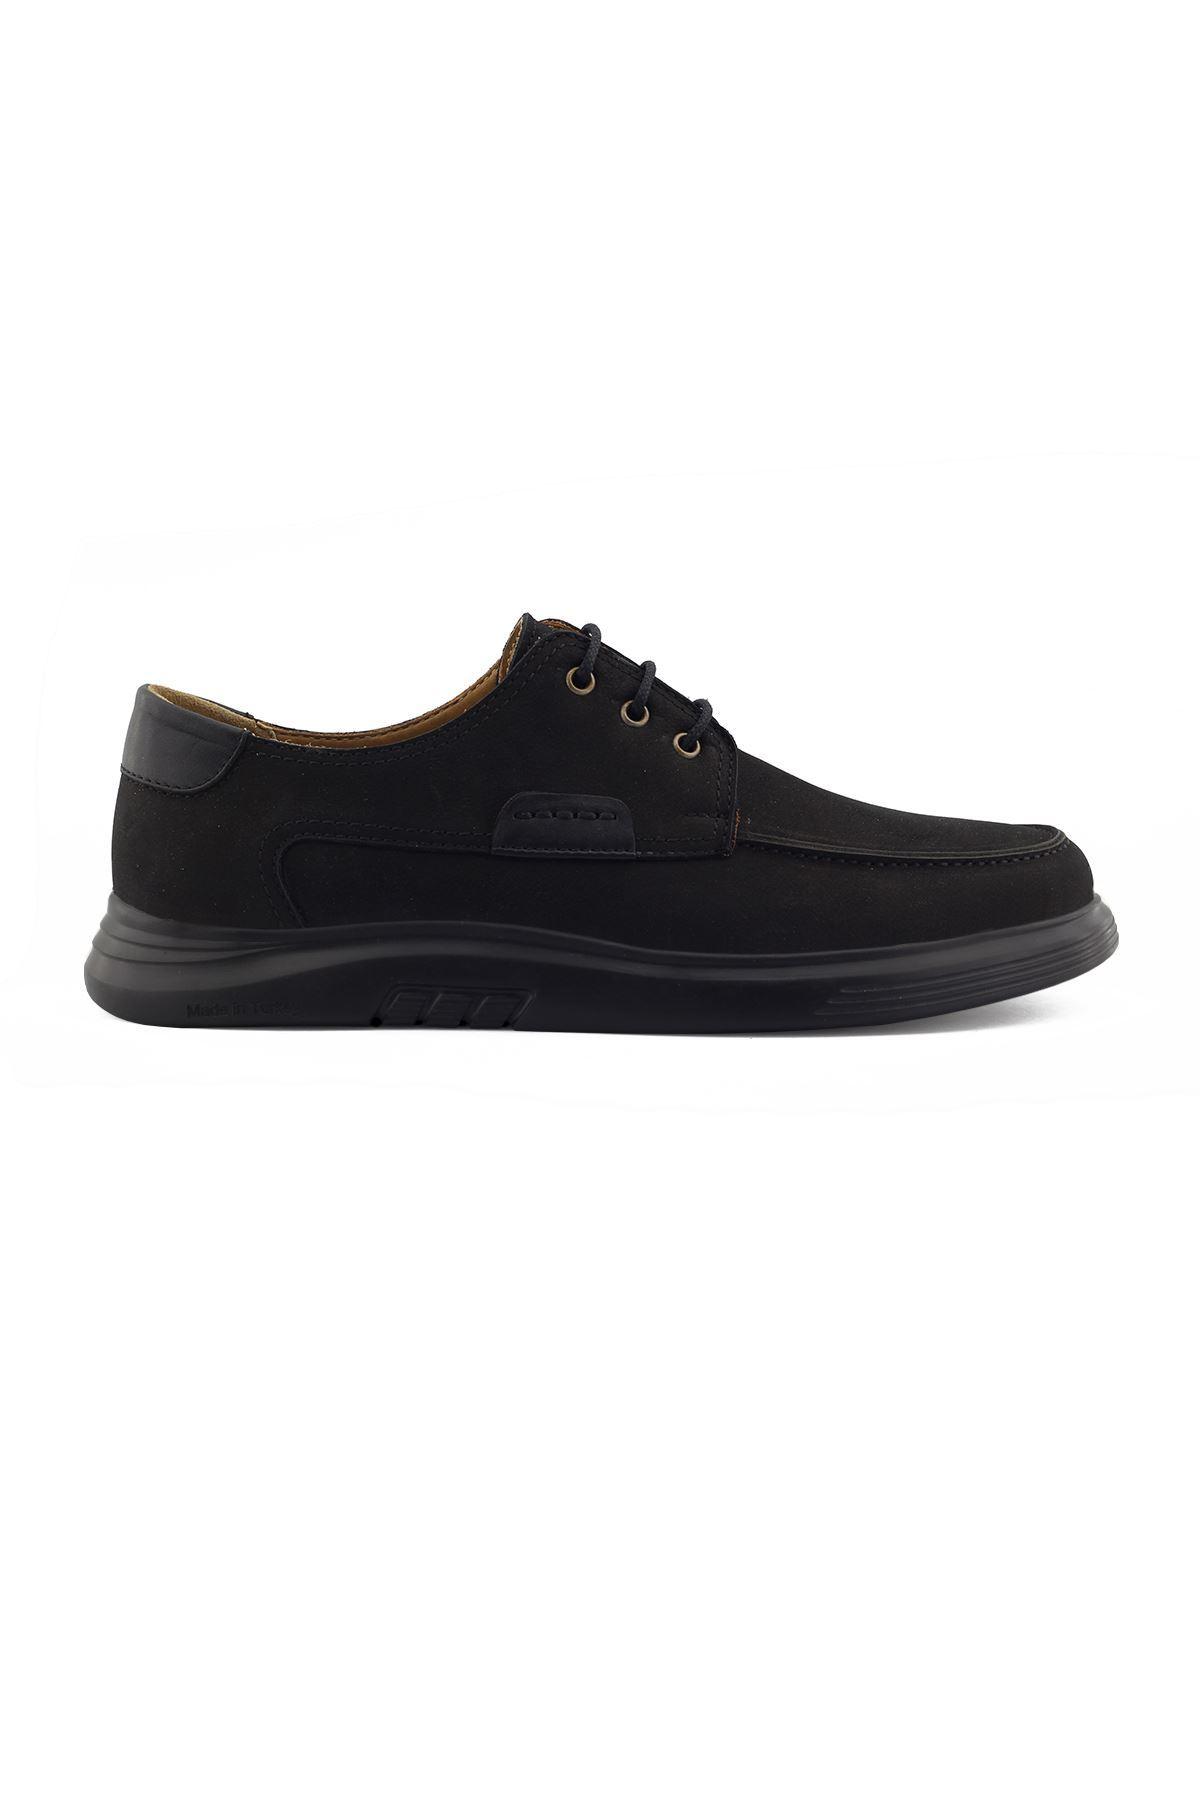 2101 Nubuk Siyah Stil Erkek Ayakkabı